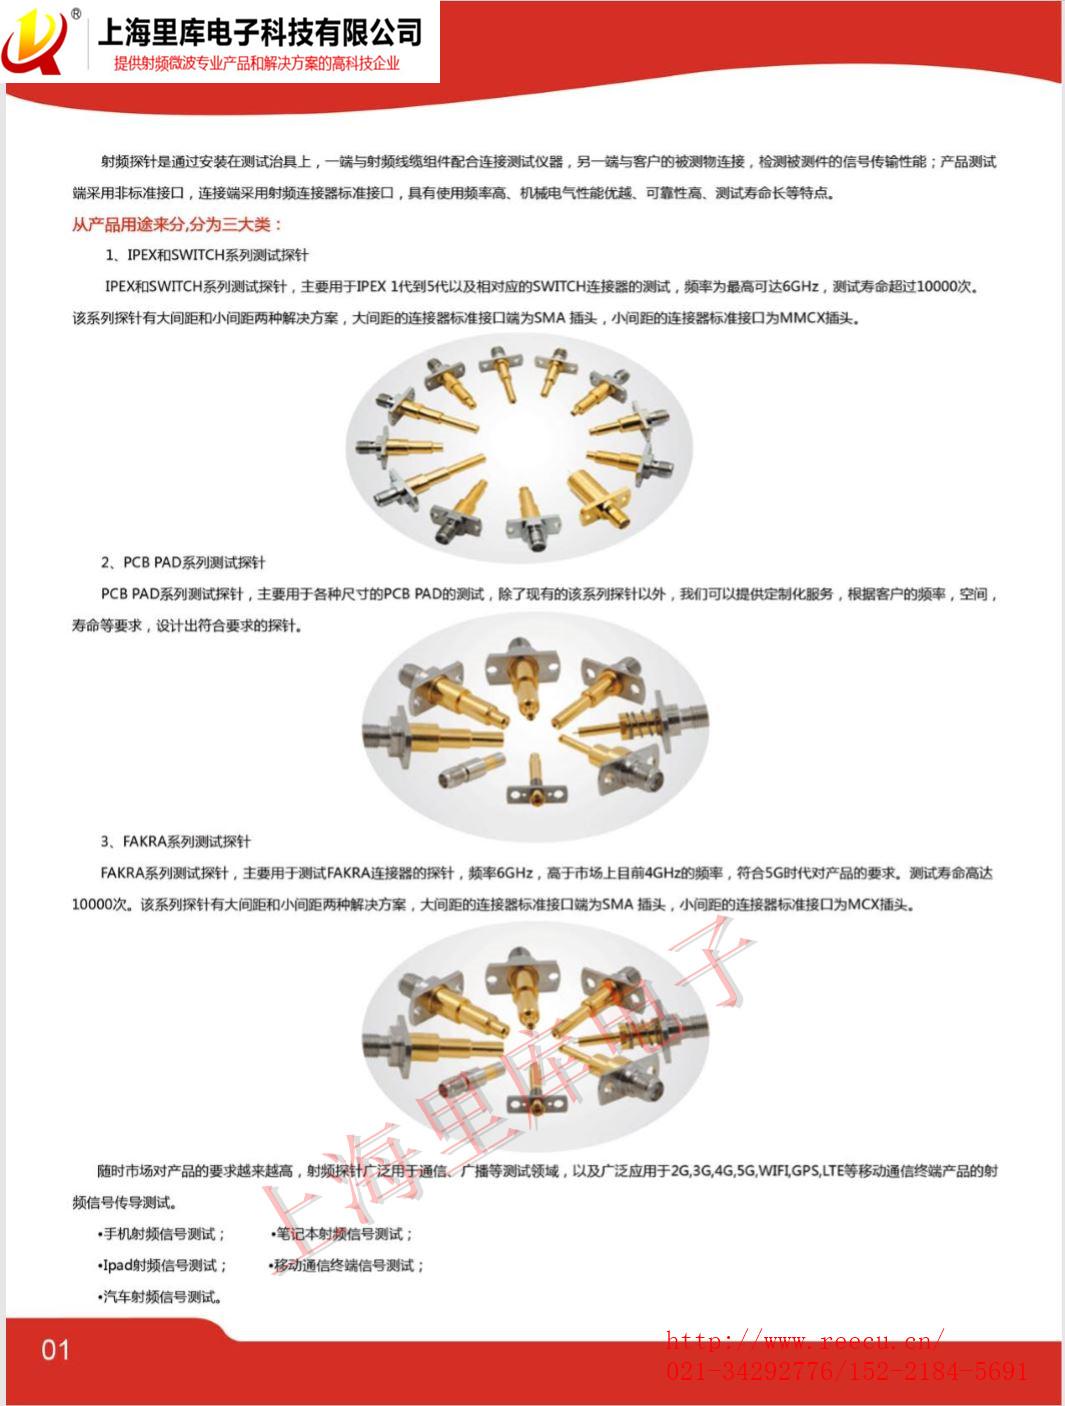 fakra母端,fakra公端连接器测试探针——上海里库电子,射频微波行业的领导者